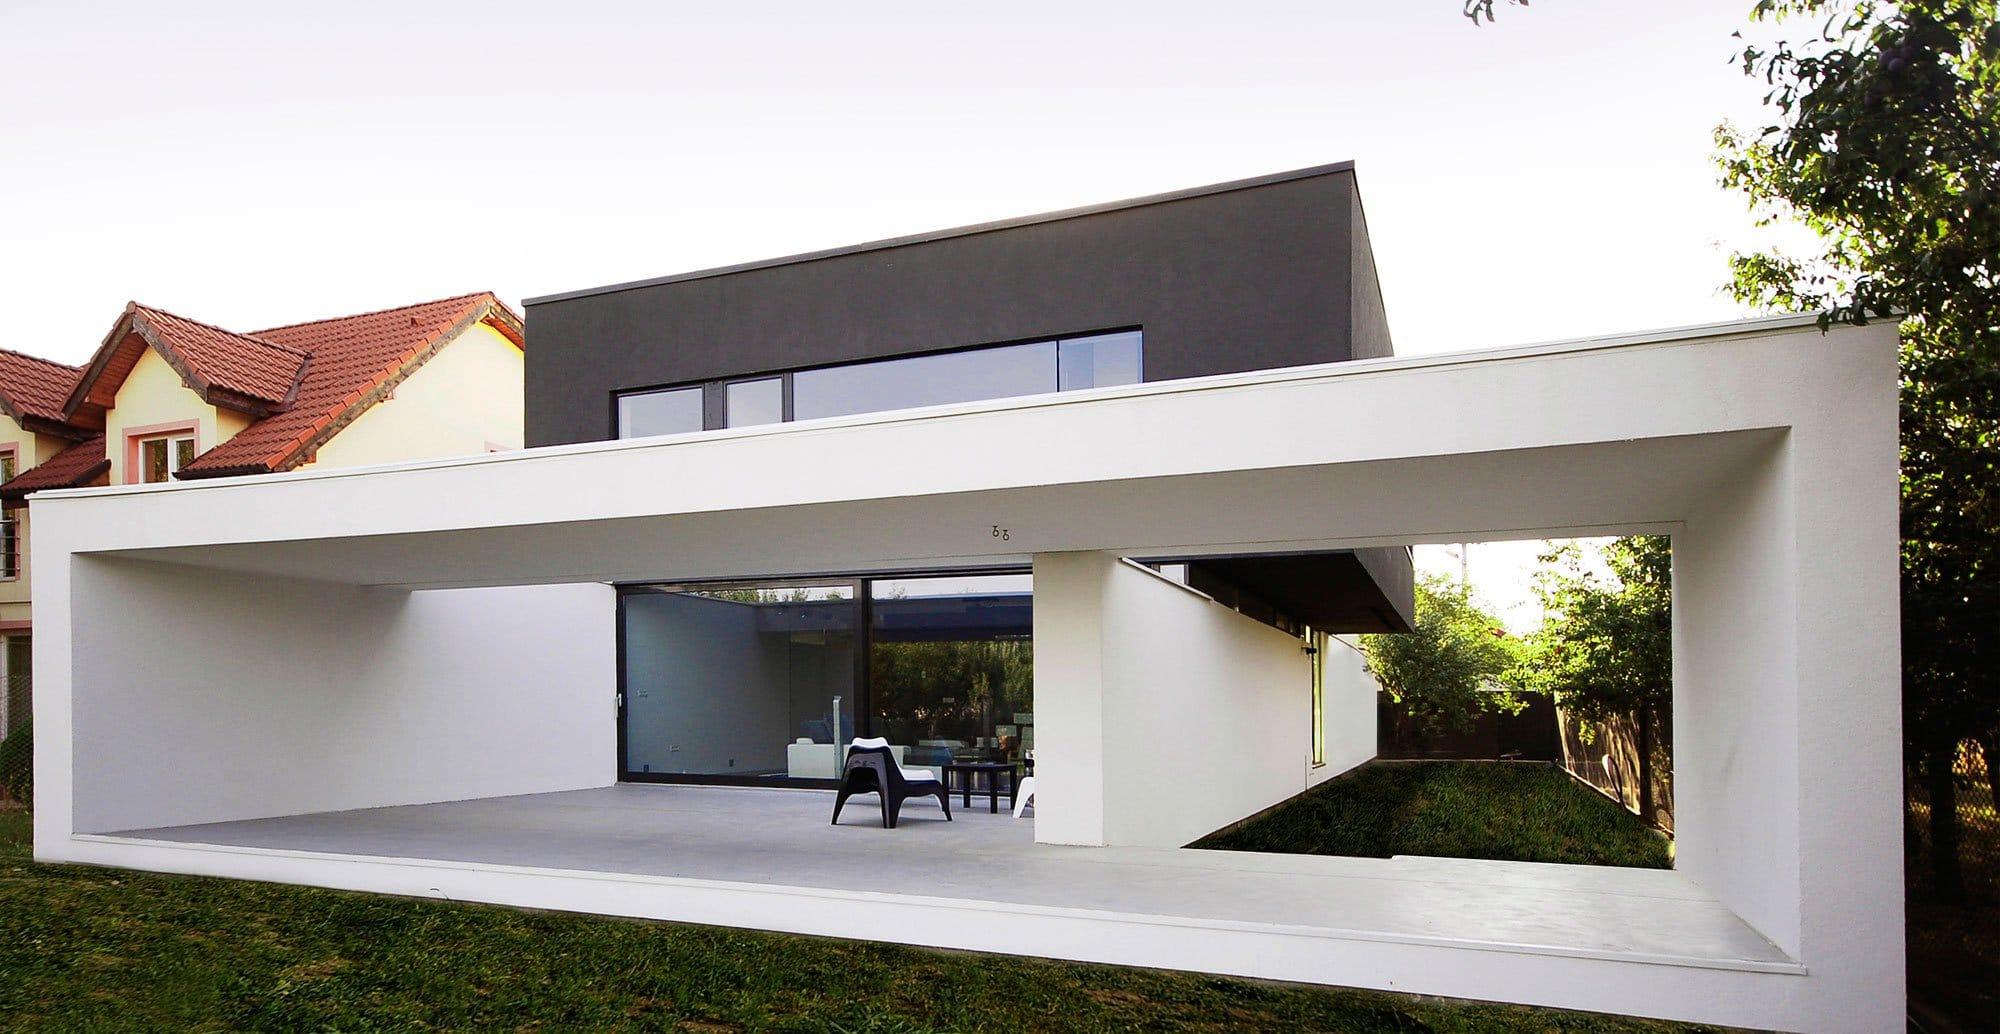 Dise o de casa moderna de dos plantas construye hogar for Viviendas modernas de una planta